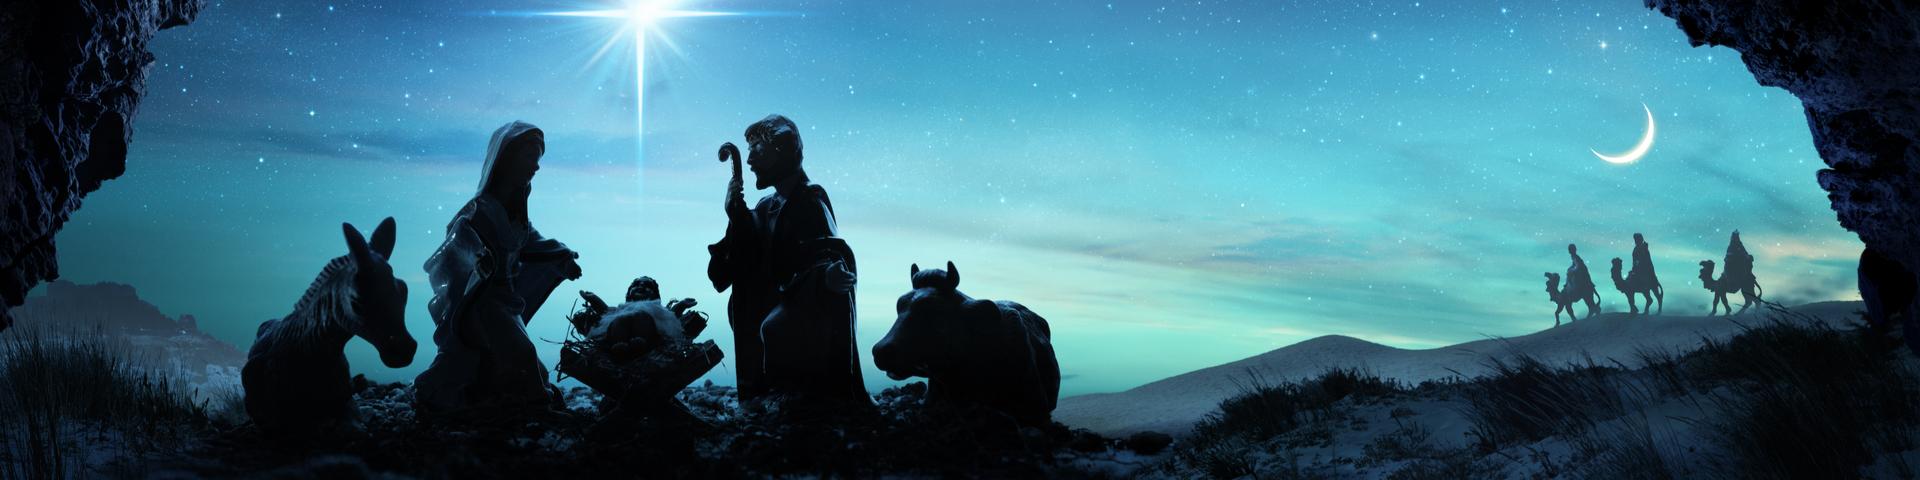 Szene Geburt Jesu